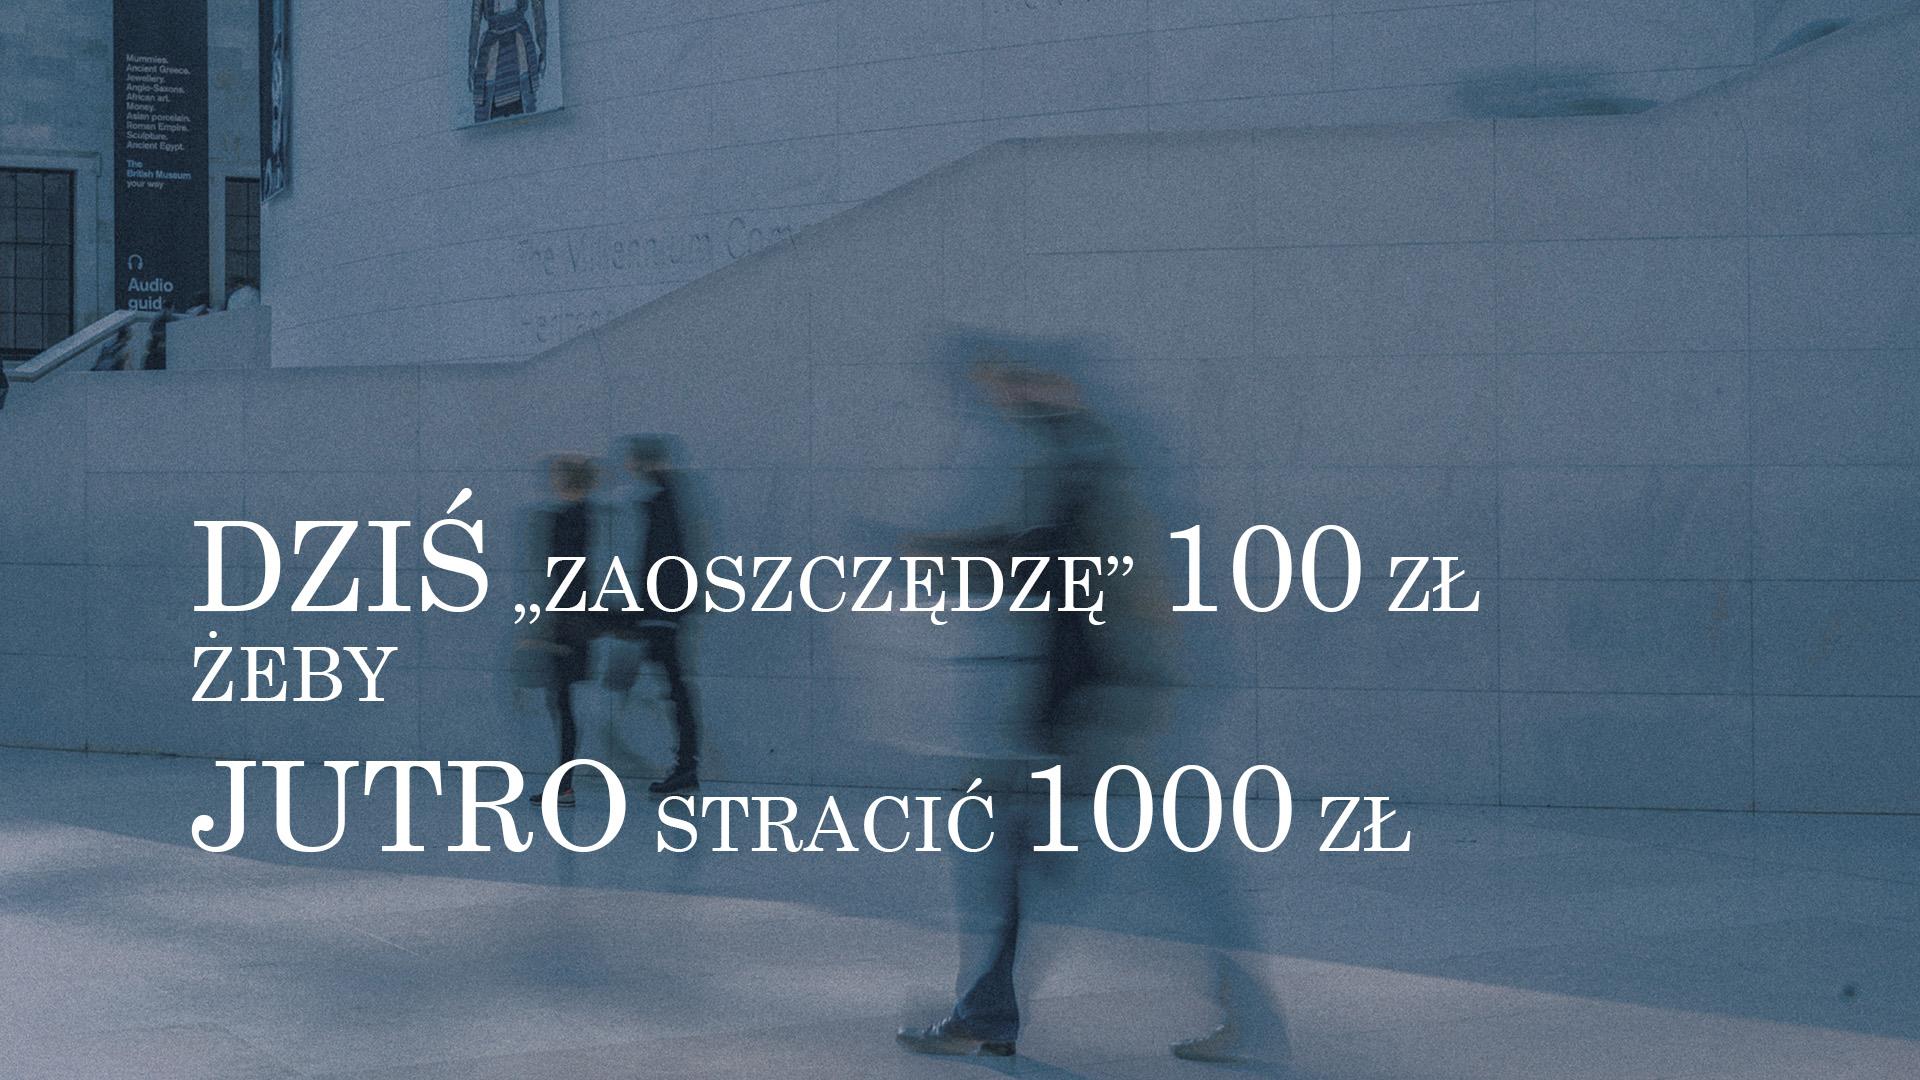 AM I REALLY SAVING MYSELF MONEY? TODAY I WILL SAVE 100 PLN TO LOSE 1000 PLN TOMORROW